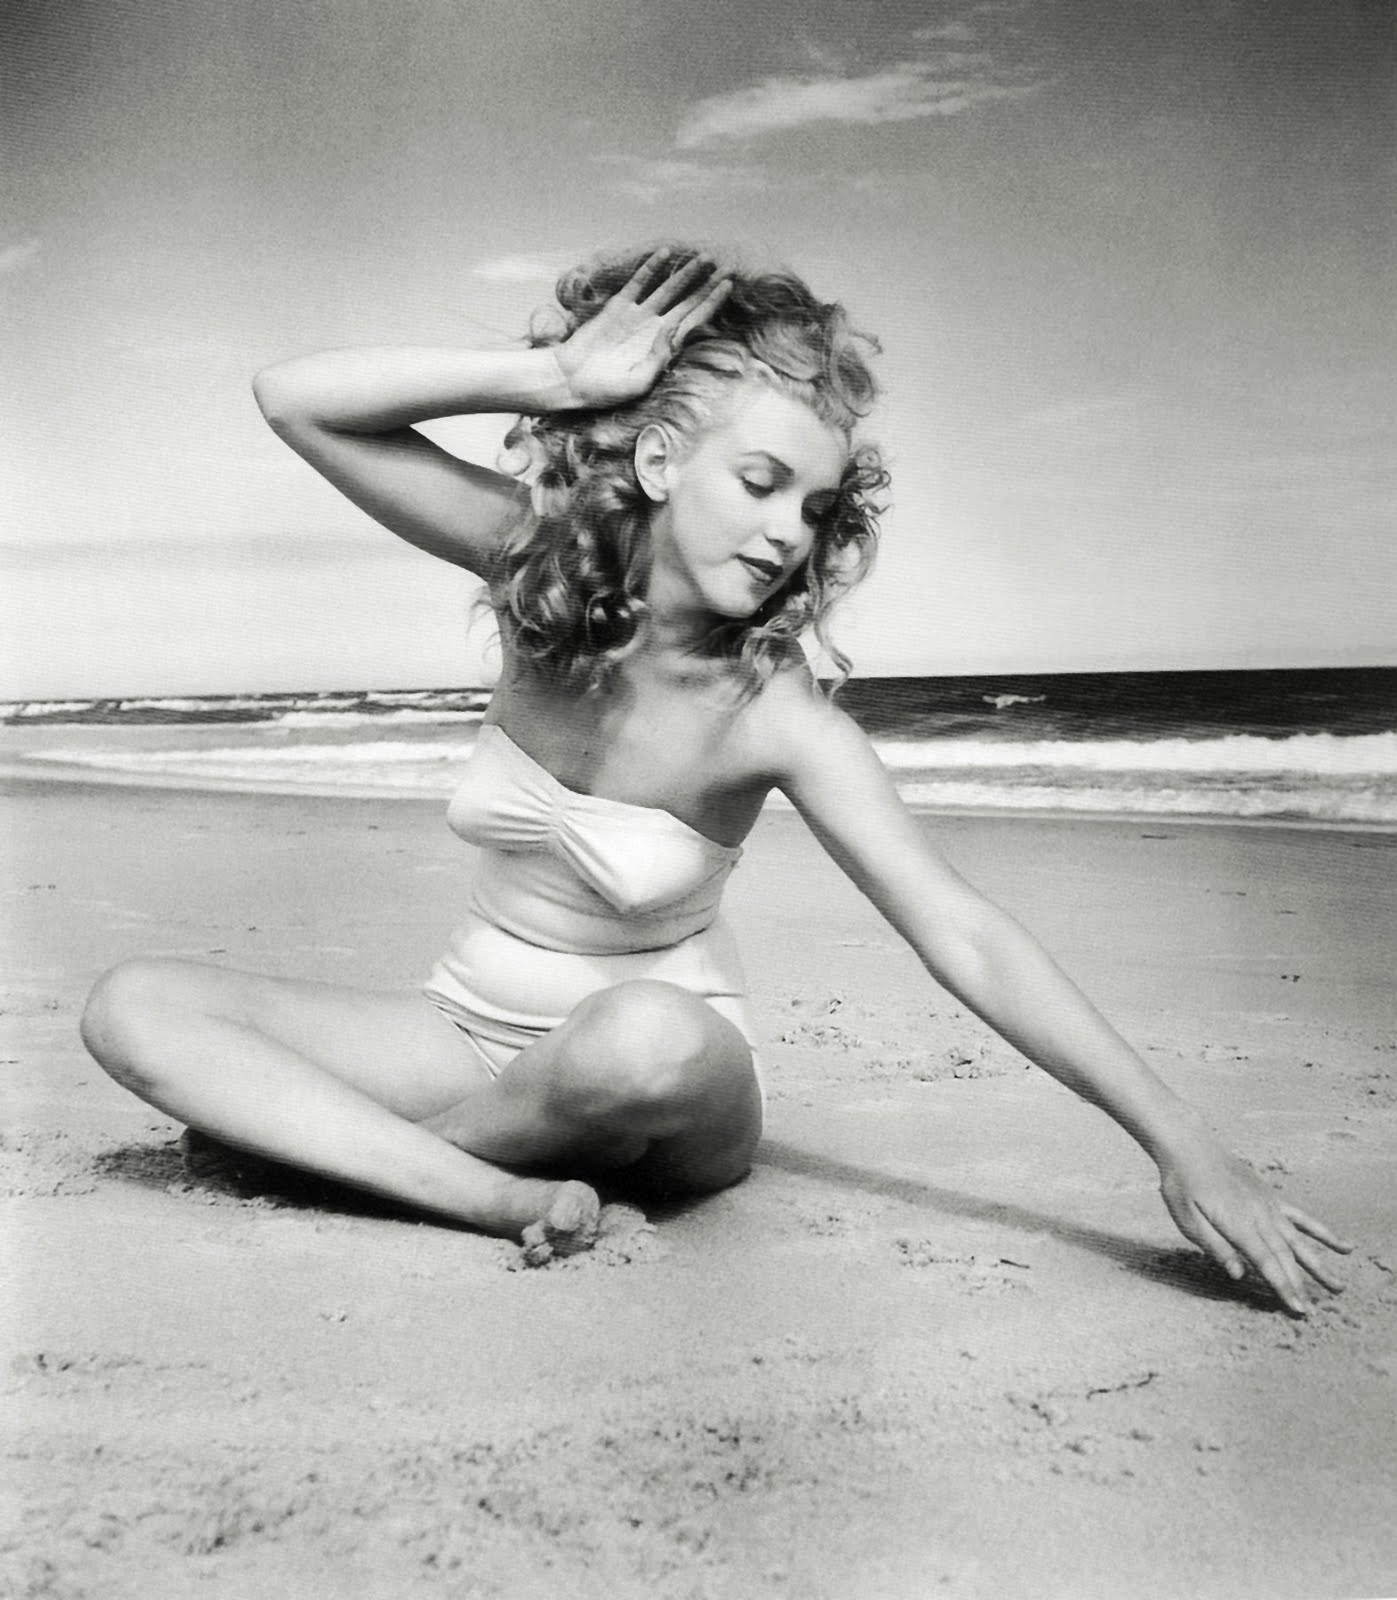 http://1.bp.blogspot.com/-98wm1PMXzC8/TmP1Dl_Q1cI/AAAAAAAADdI/eal9PVjxEUc/s1600/marilyn_monroe_1949_beach_photoshoot_018.jpg